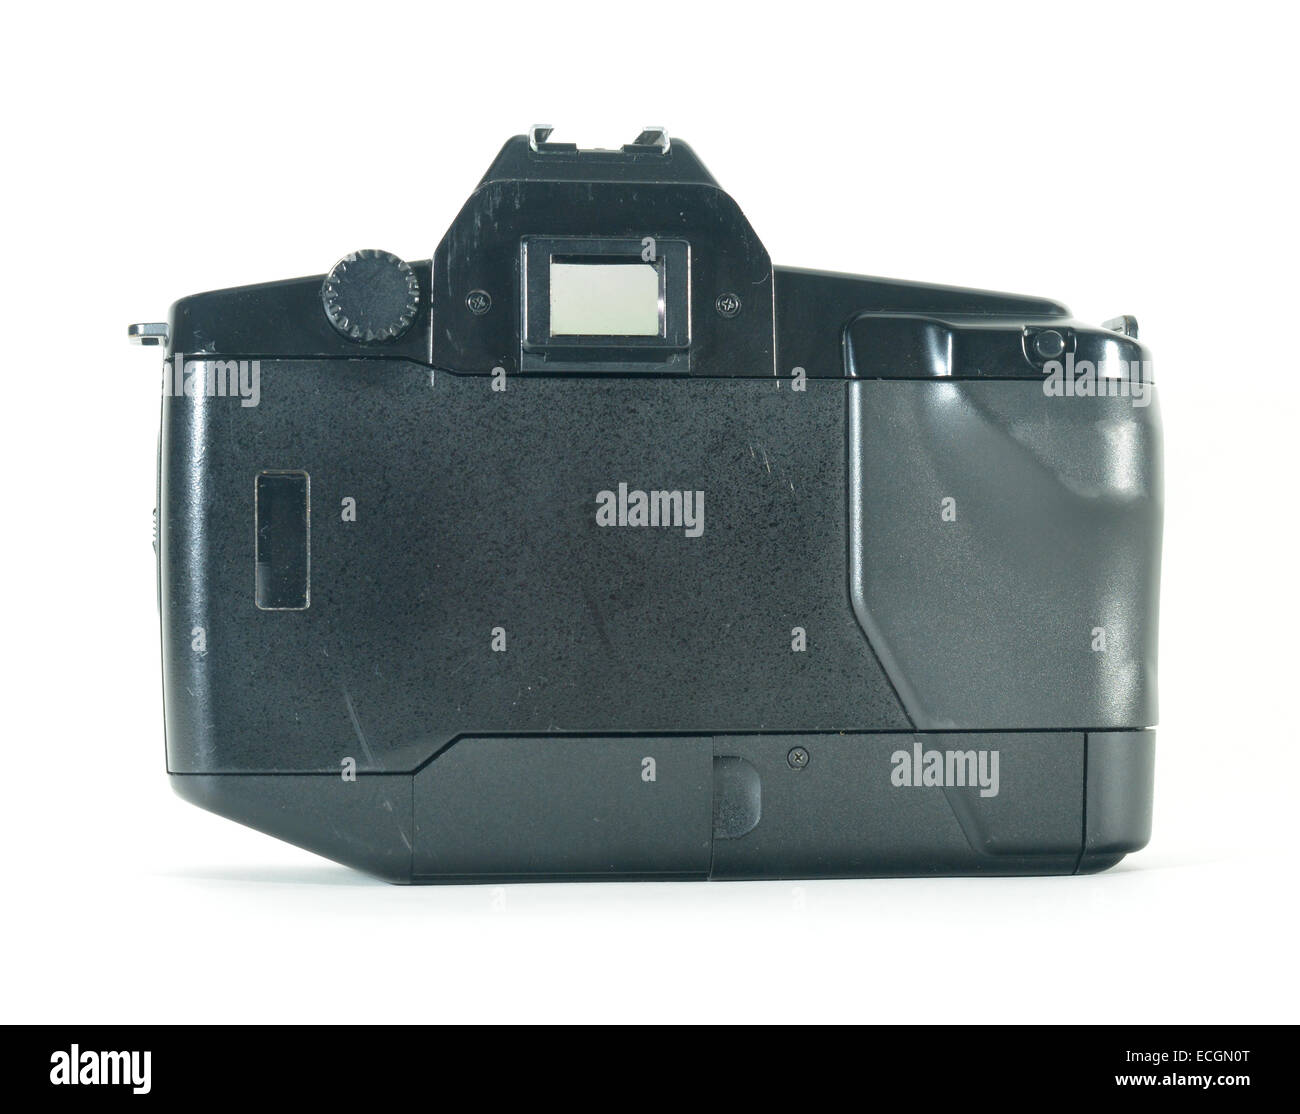 Canon EOS 650 SLR film camera, first generation of the auto focus range - Stock Image